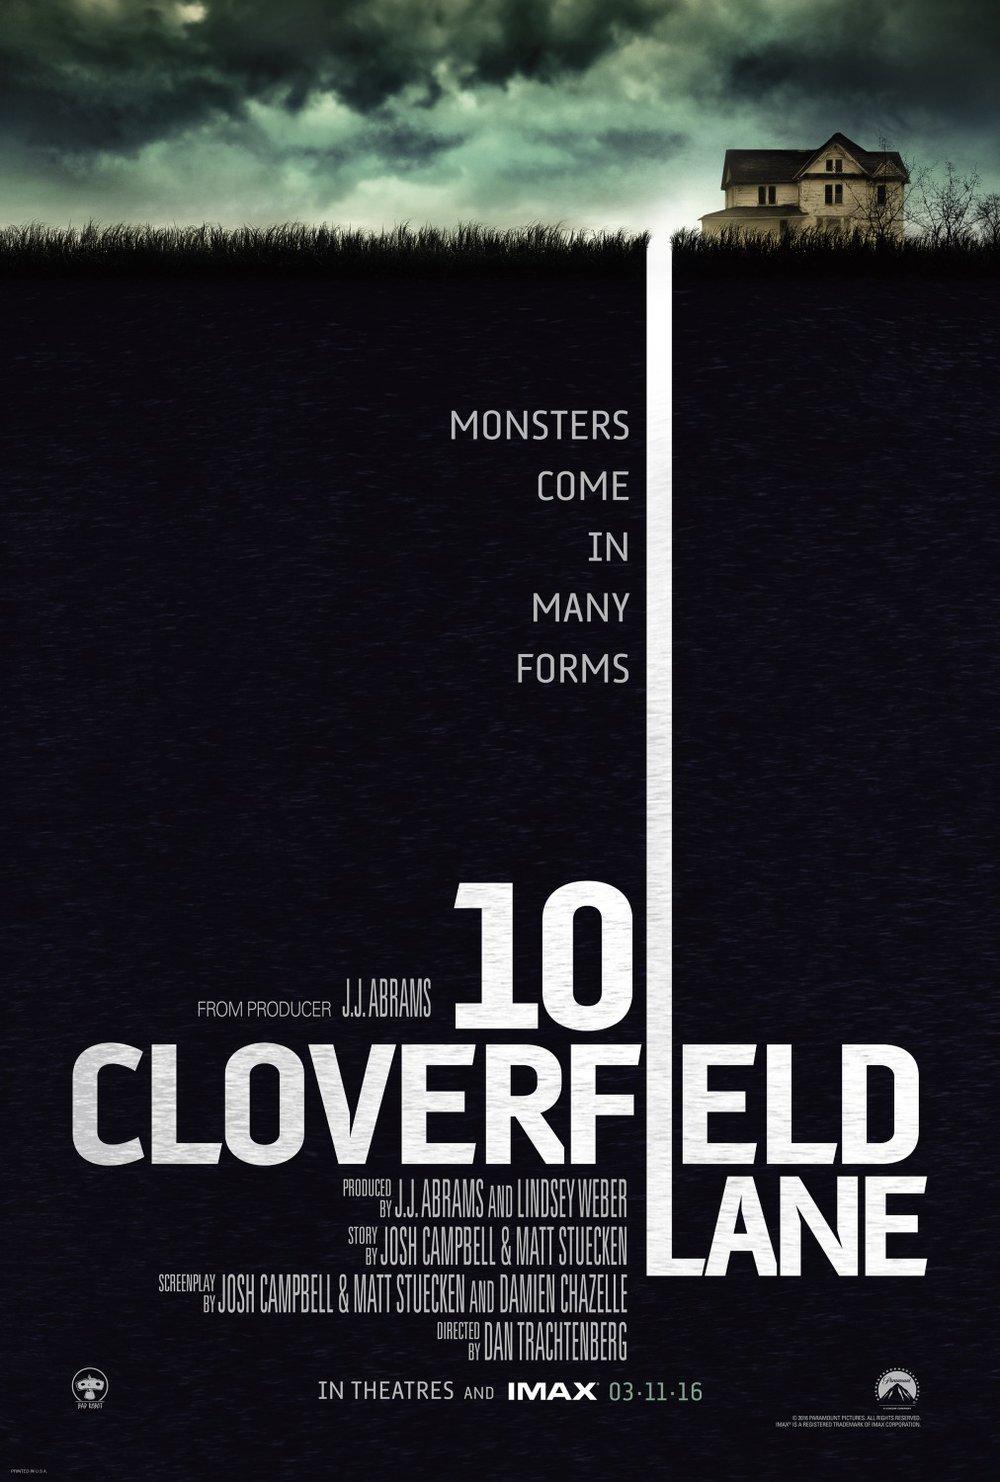 10-cloverfield-lane-poster.jpg